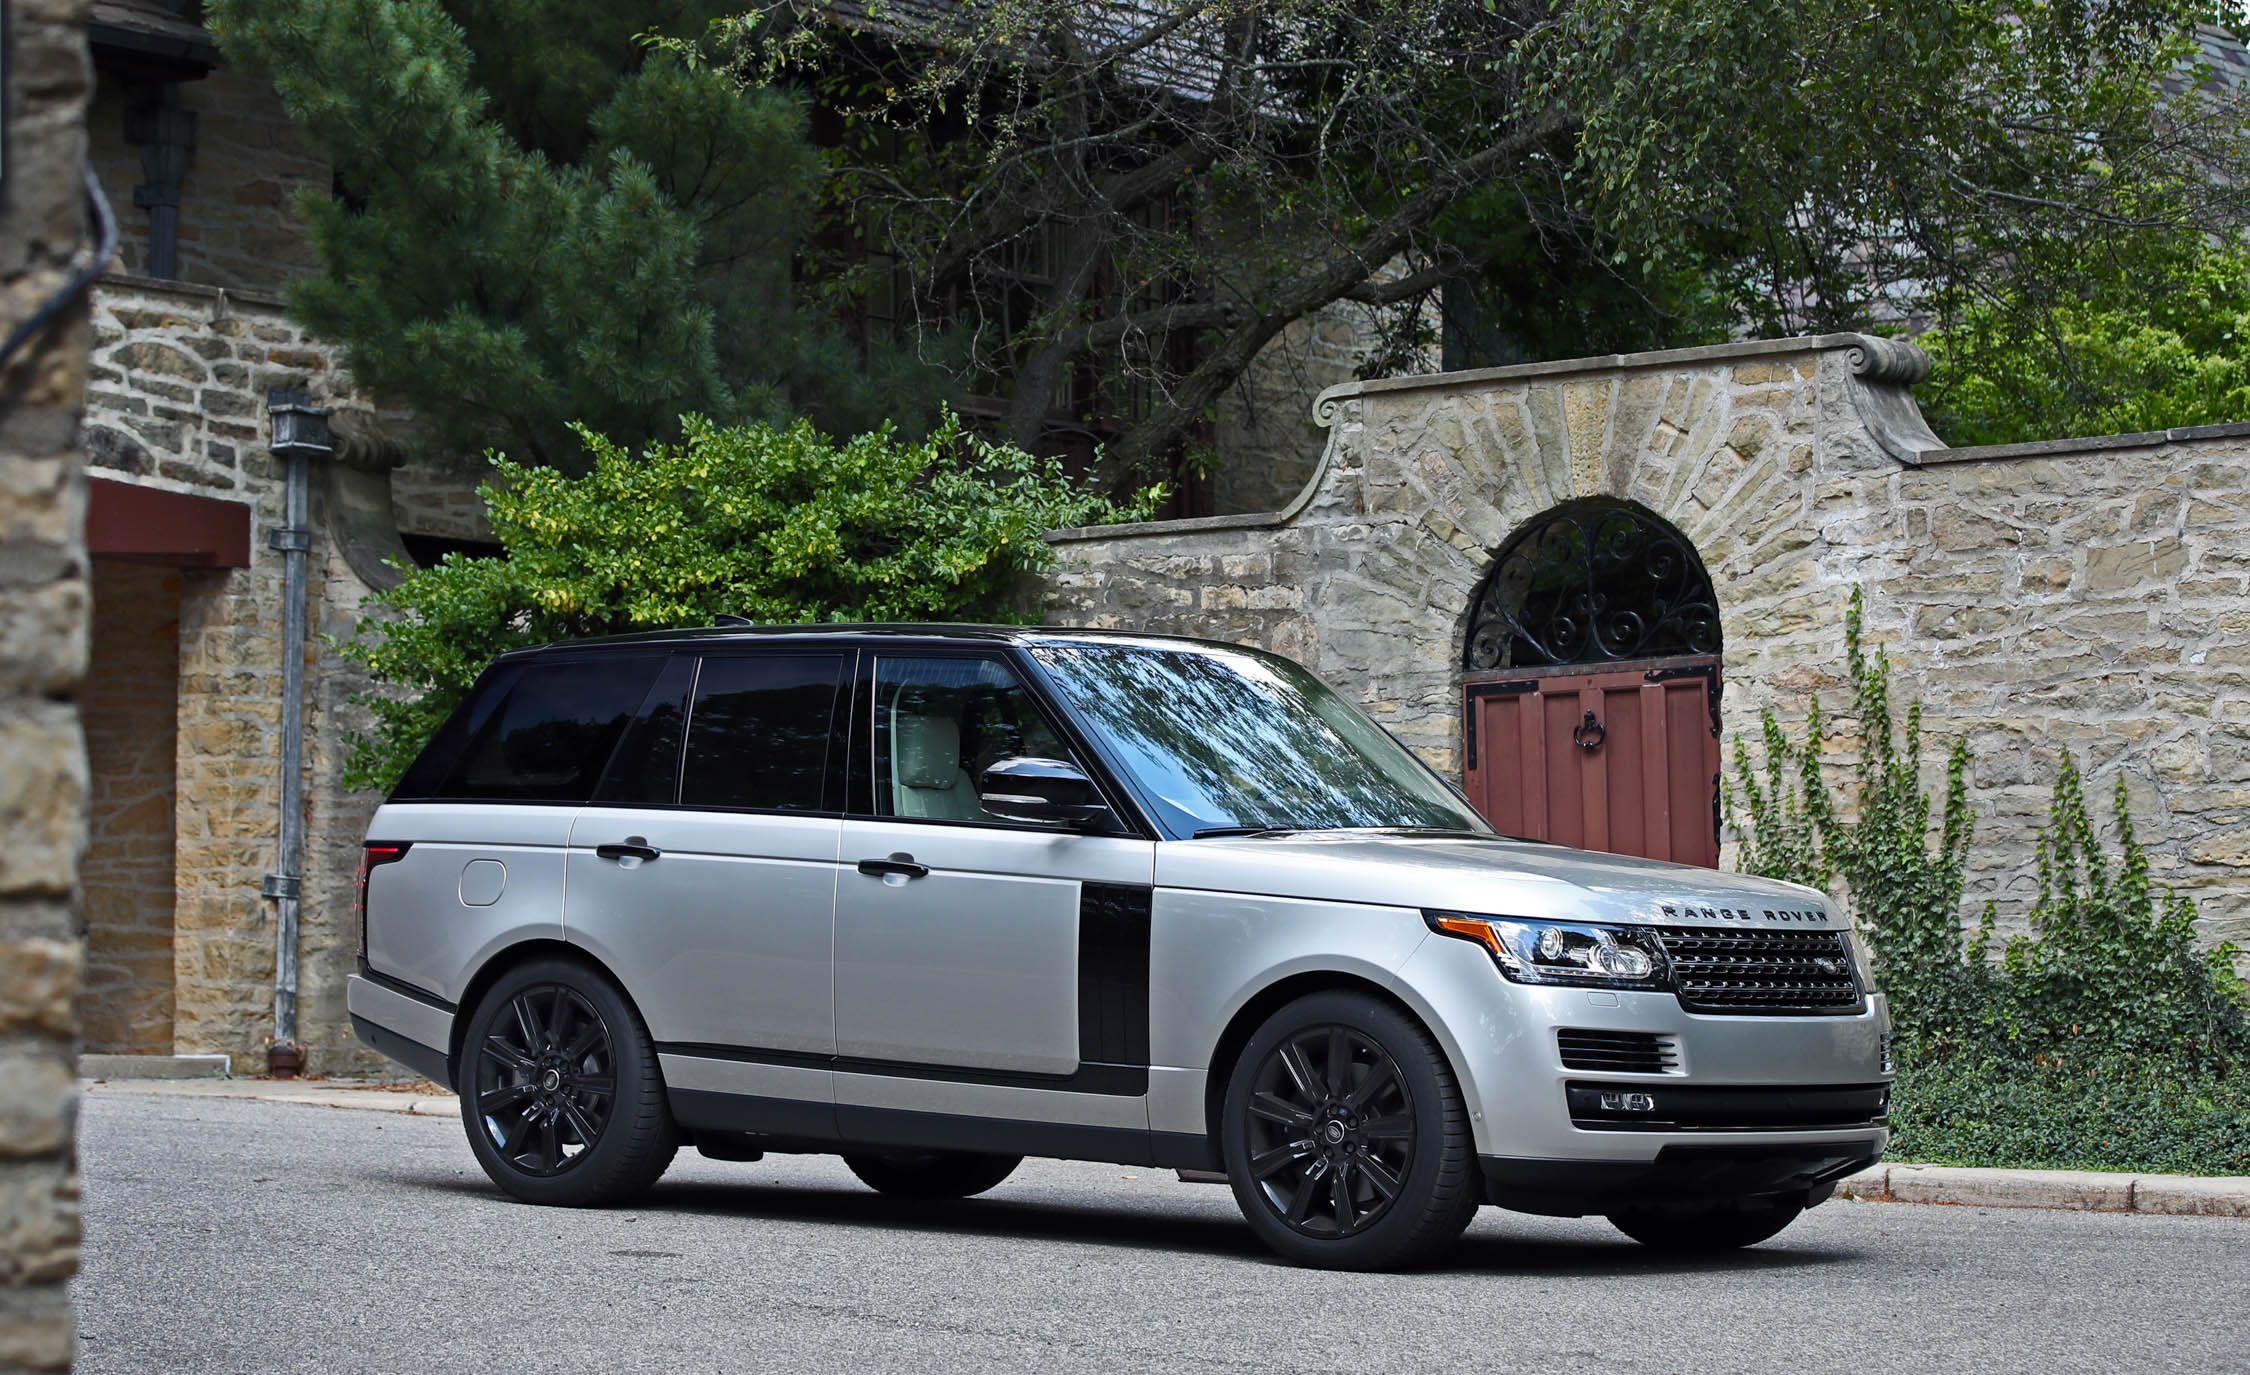 Land Rover Range Rover 2017 Interior >> 2017 Land Rover Range Rover Cargo Space And Storage Review Car